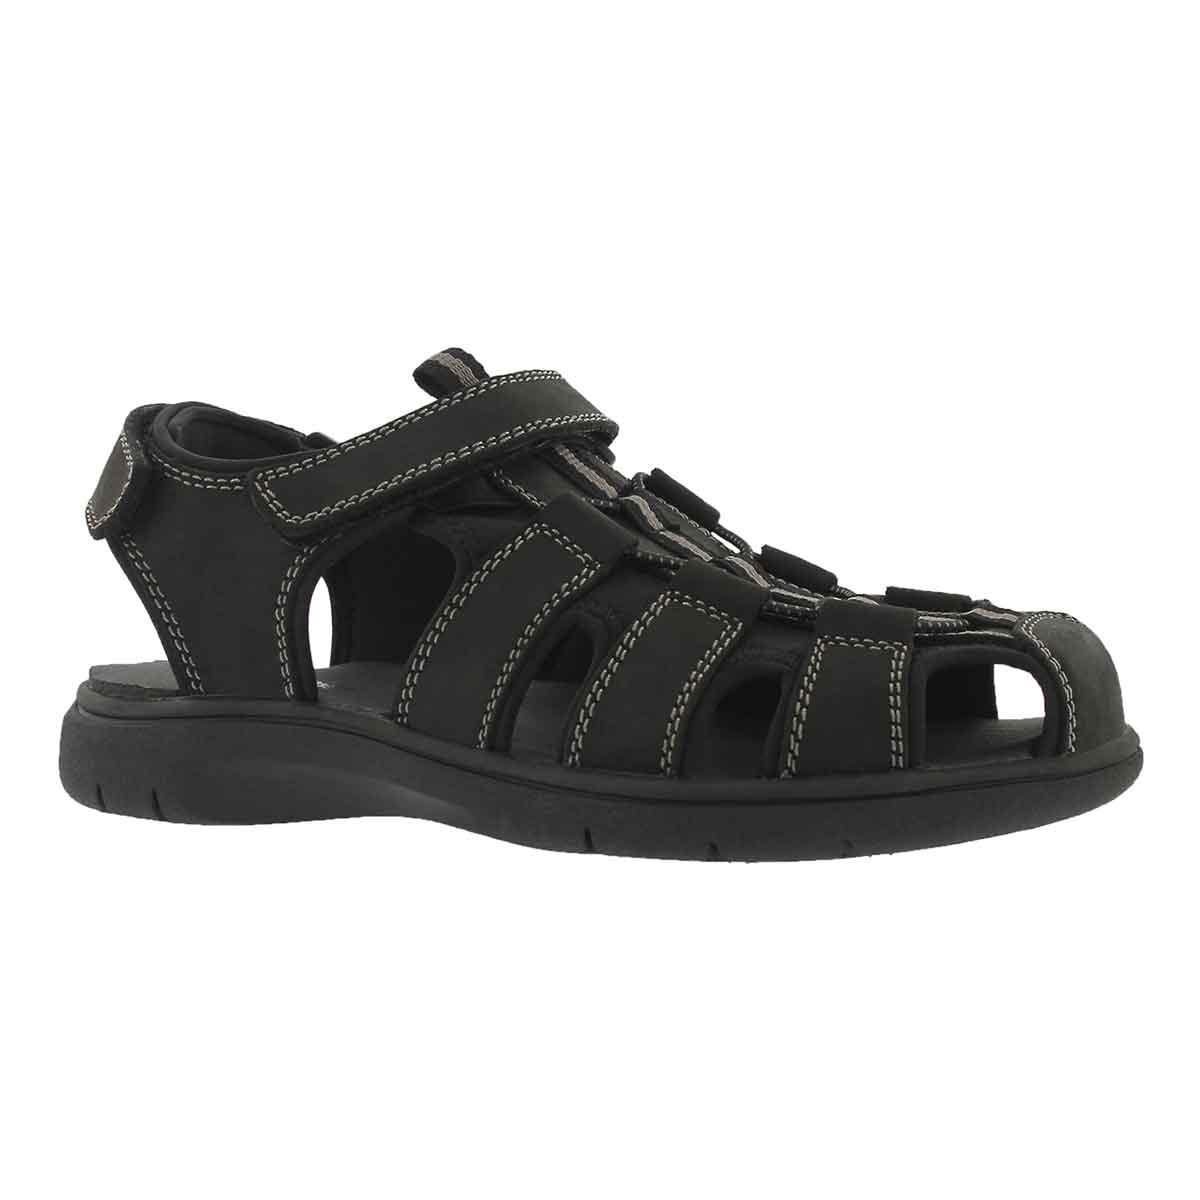 Men's LINUS black fisherman sandals